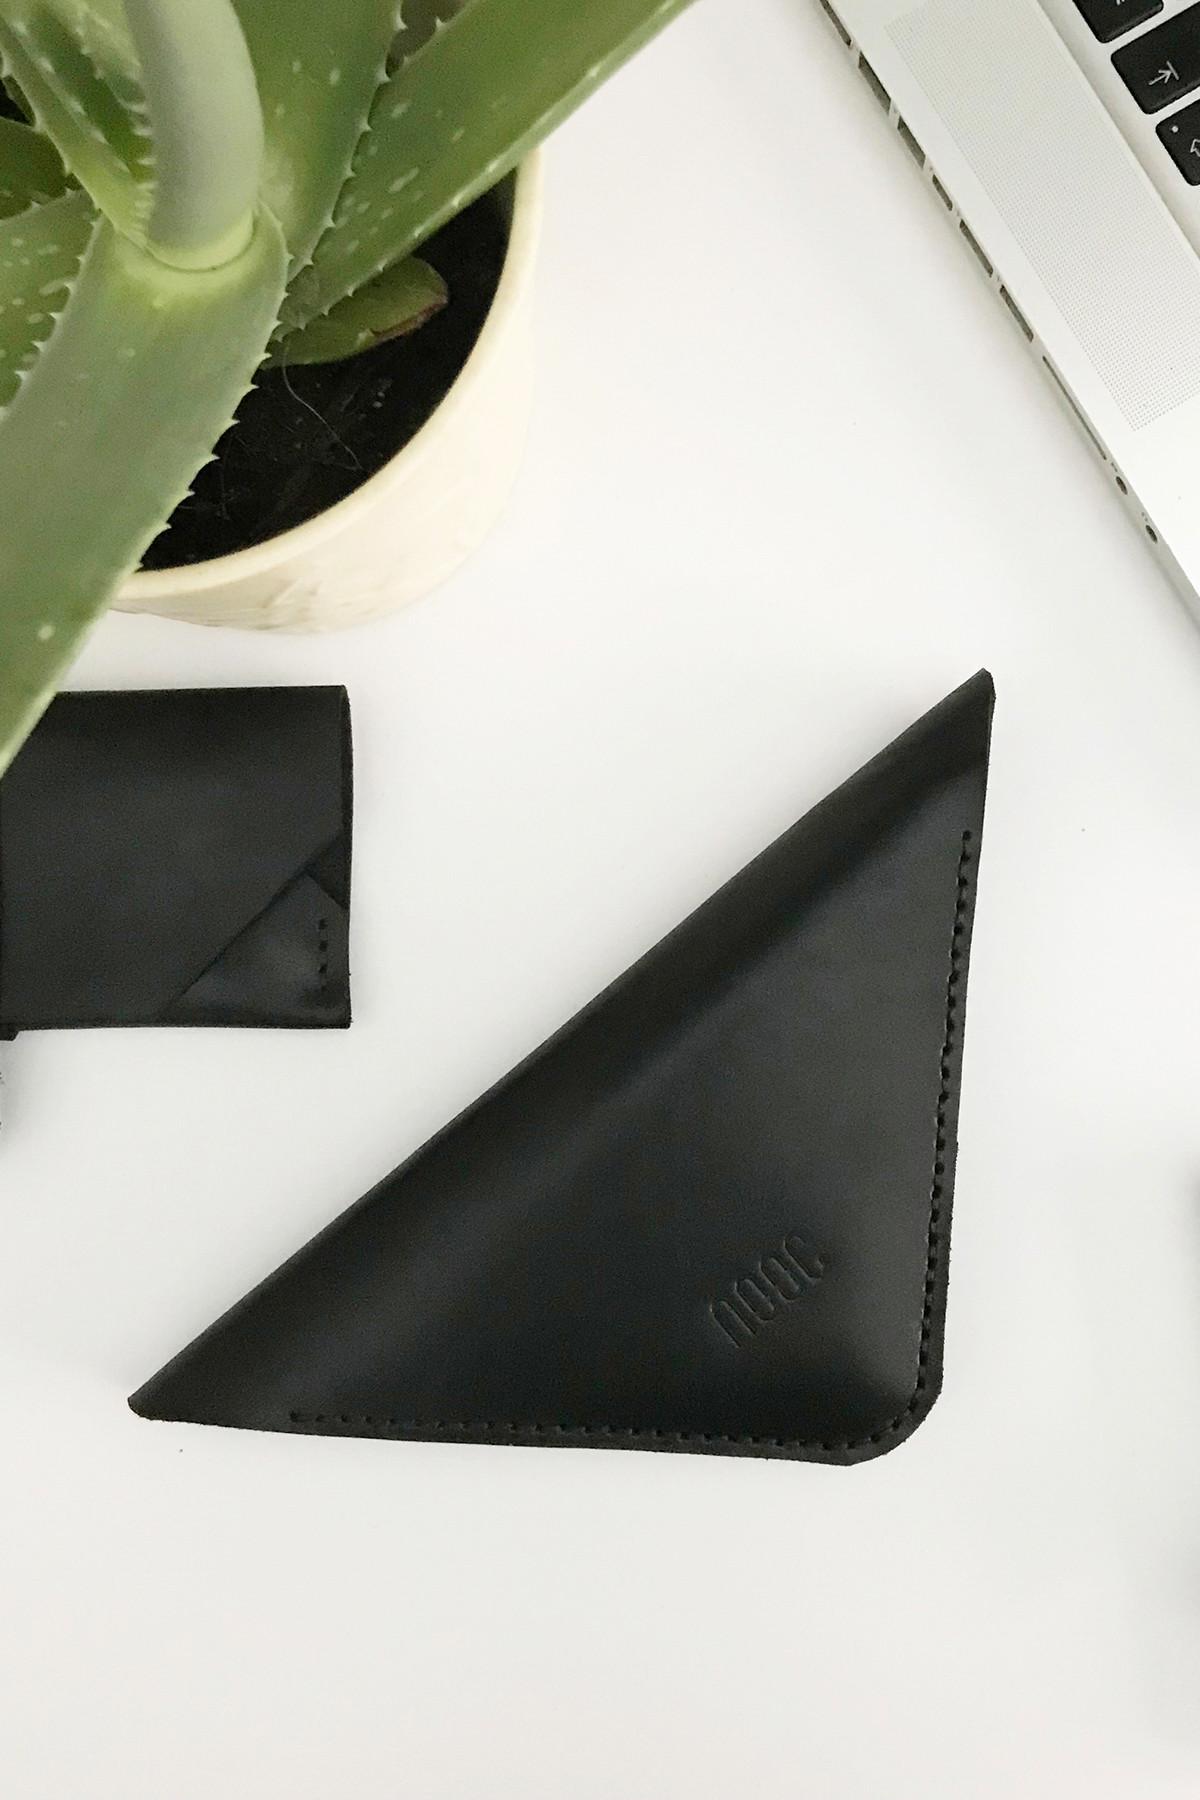 NOOC Soho Black Üçgen Cüzdan 1